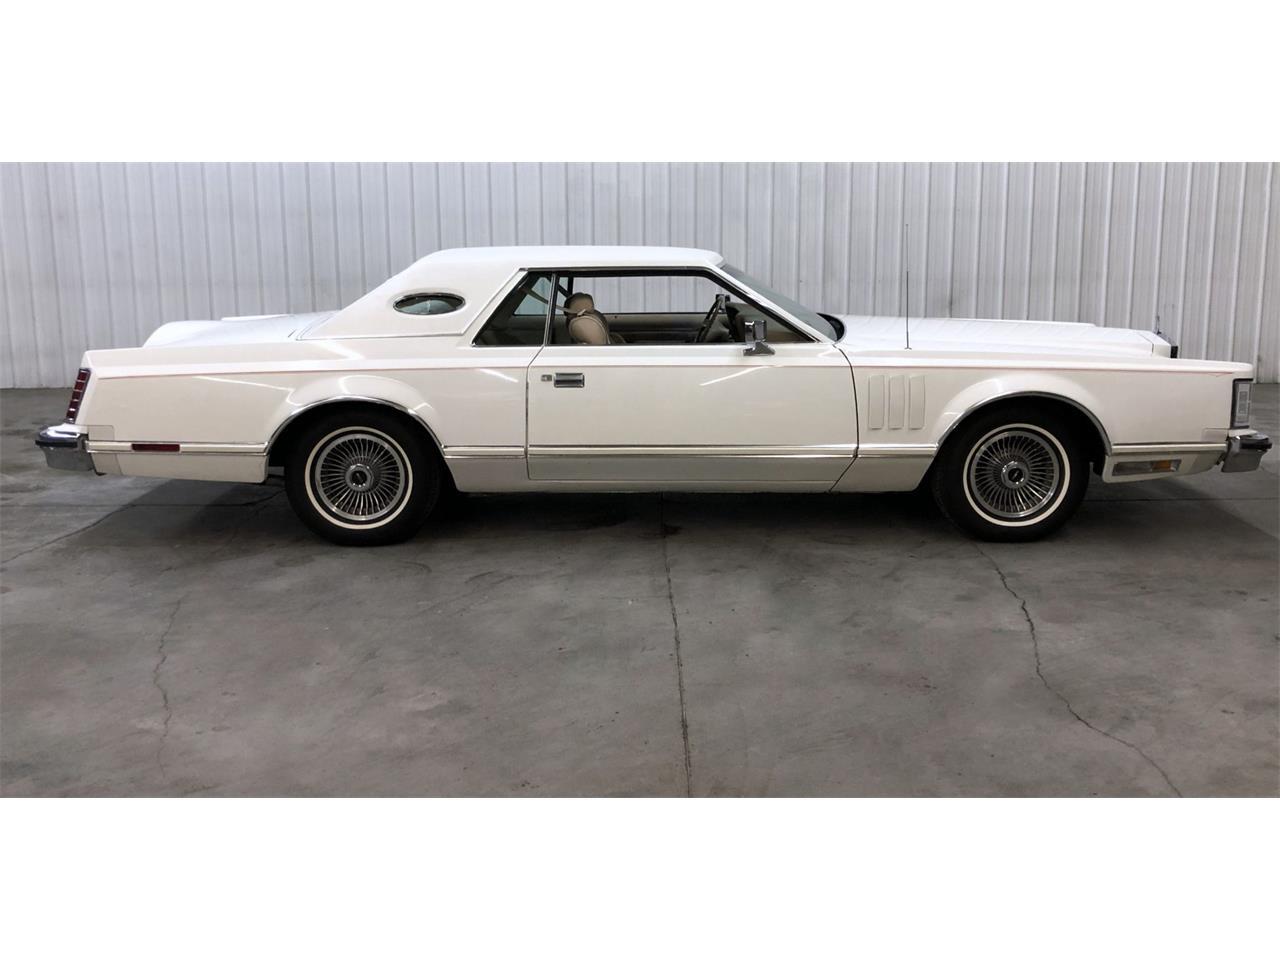 1978 Lincoln Mark V (CC-1273822) for sale in Maple Lake, Minnesota